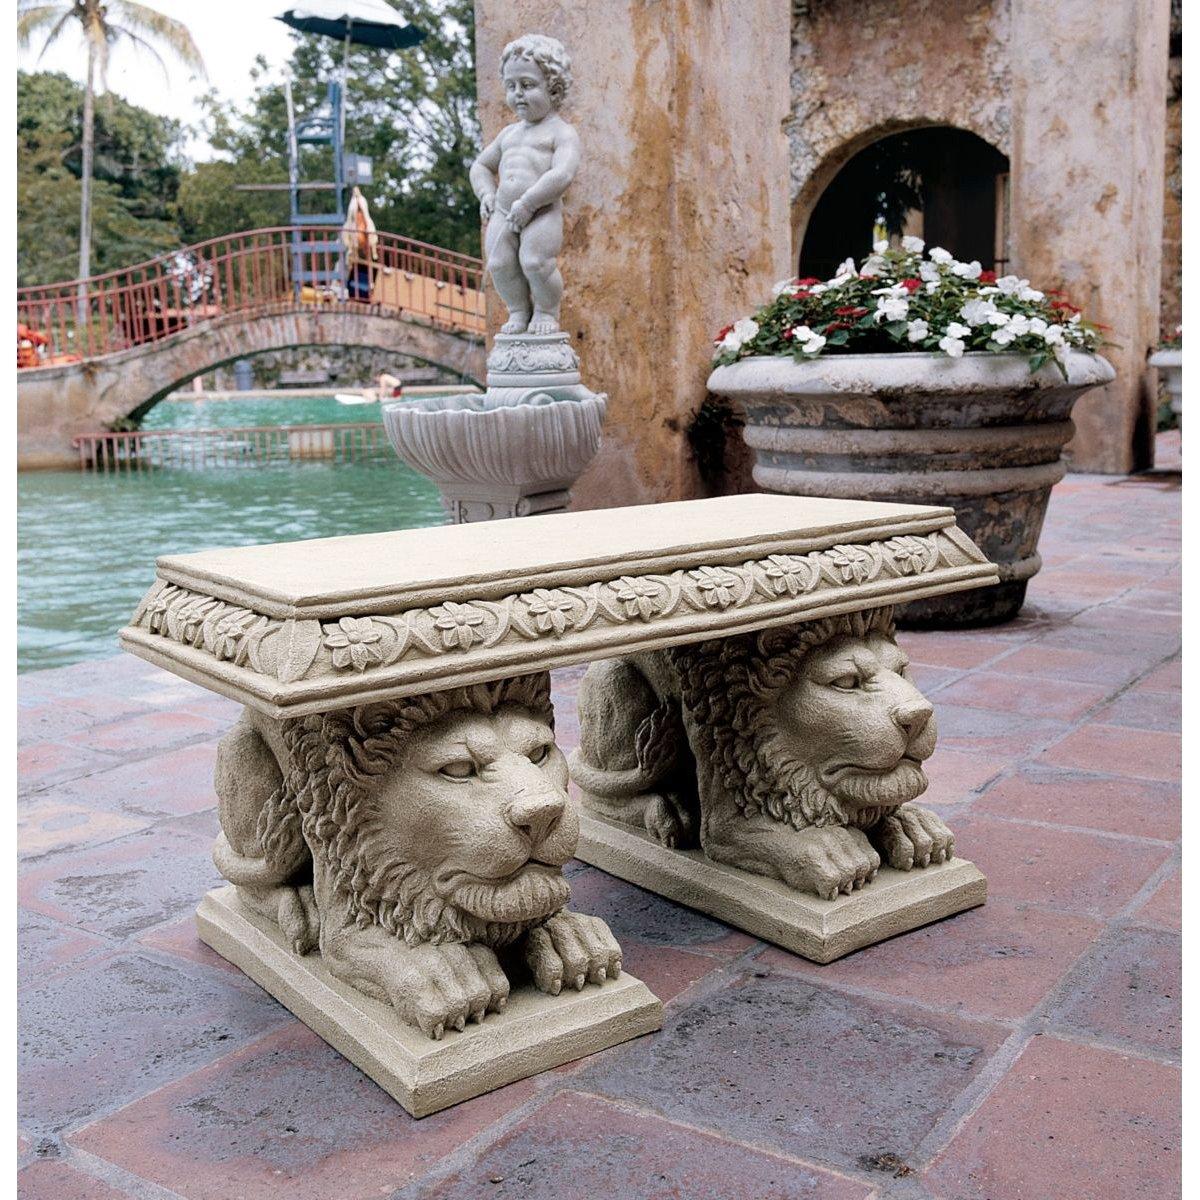 Design Toscano Grand Lion of St. Johns Square Sculptural Bench